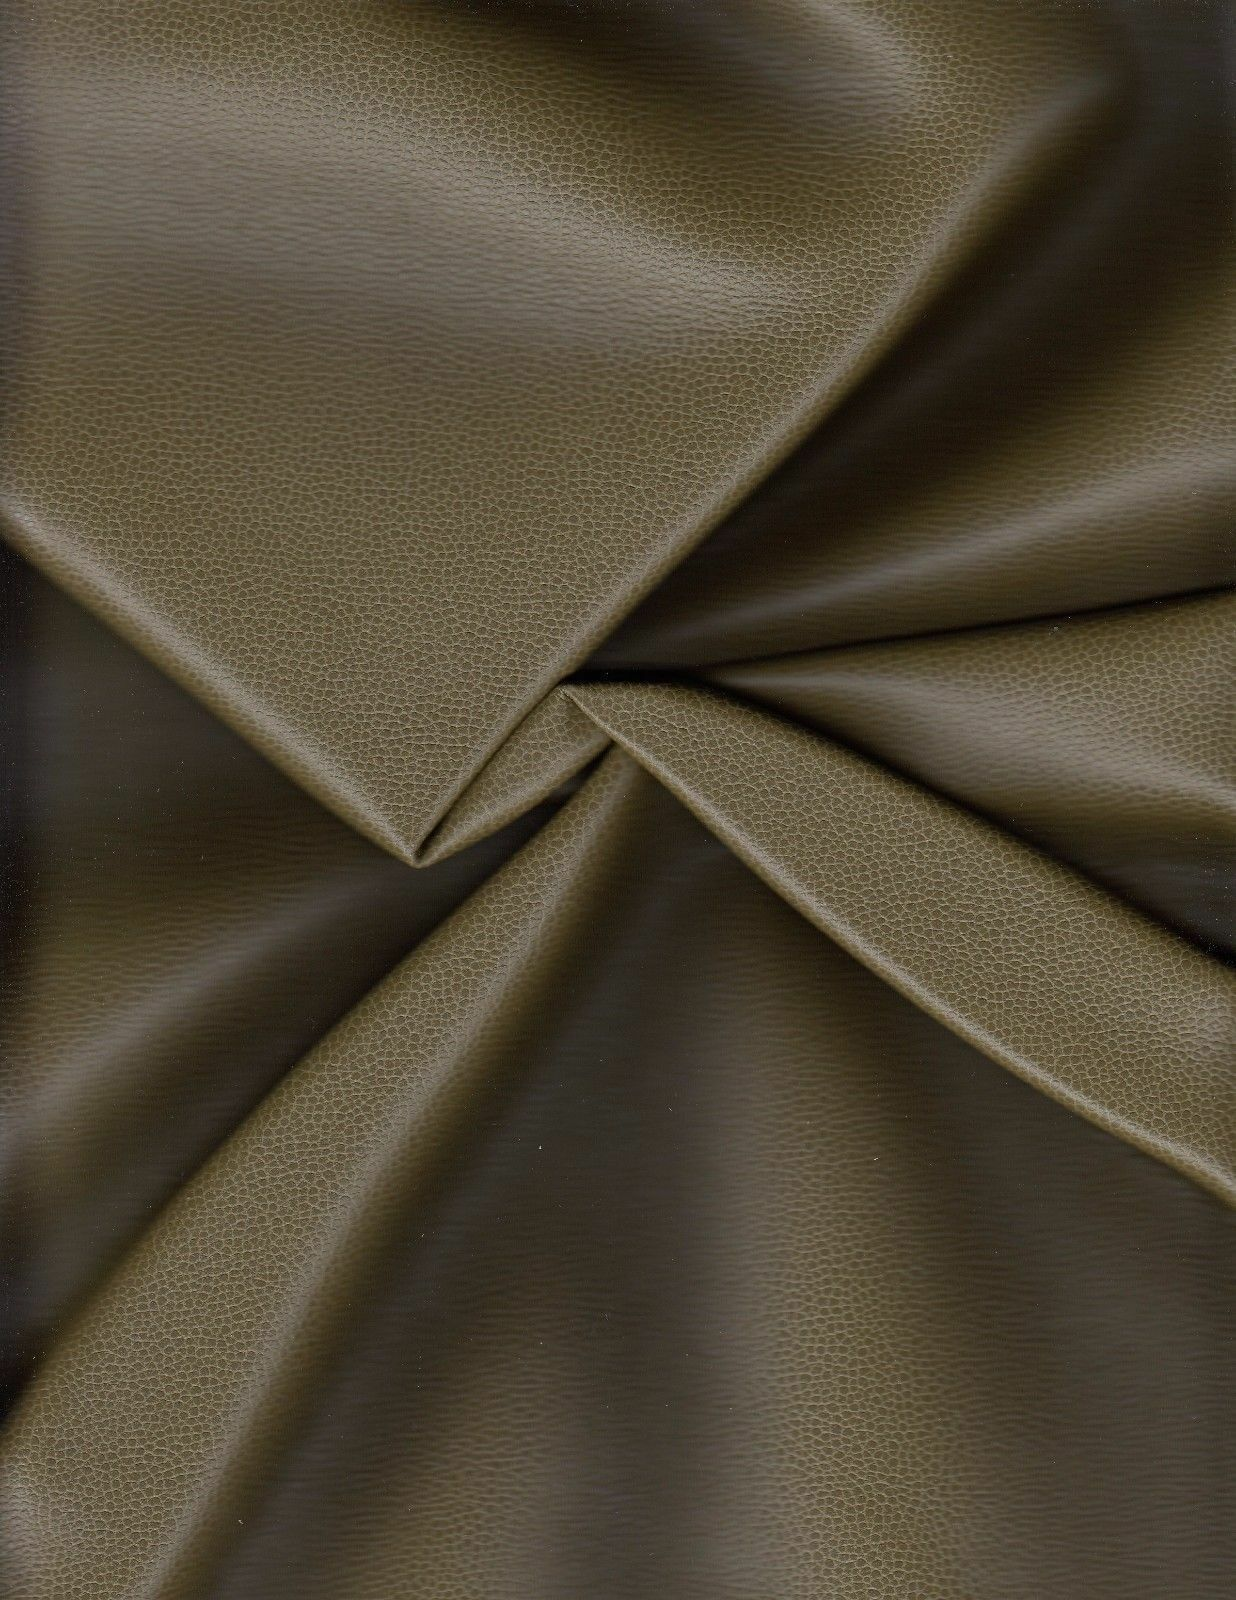 Ultrafabrics Tappezzeria Similpelle 363-4514 Promessa Verde Muschio 2.6m T-76